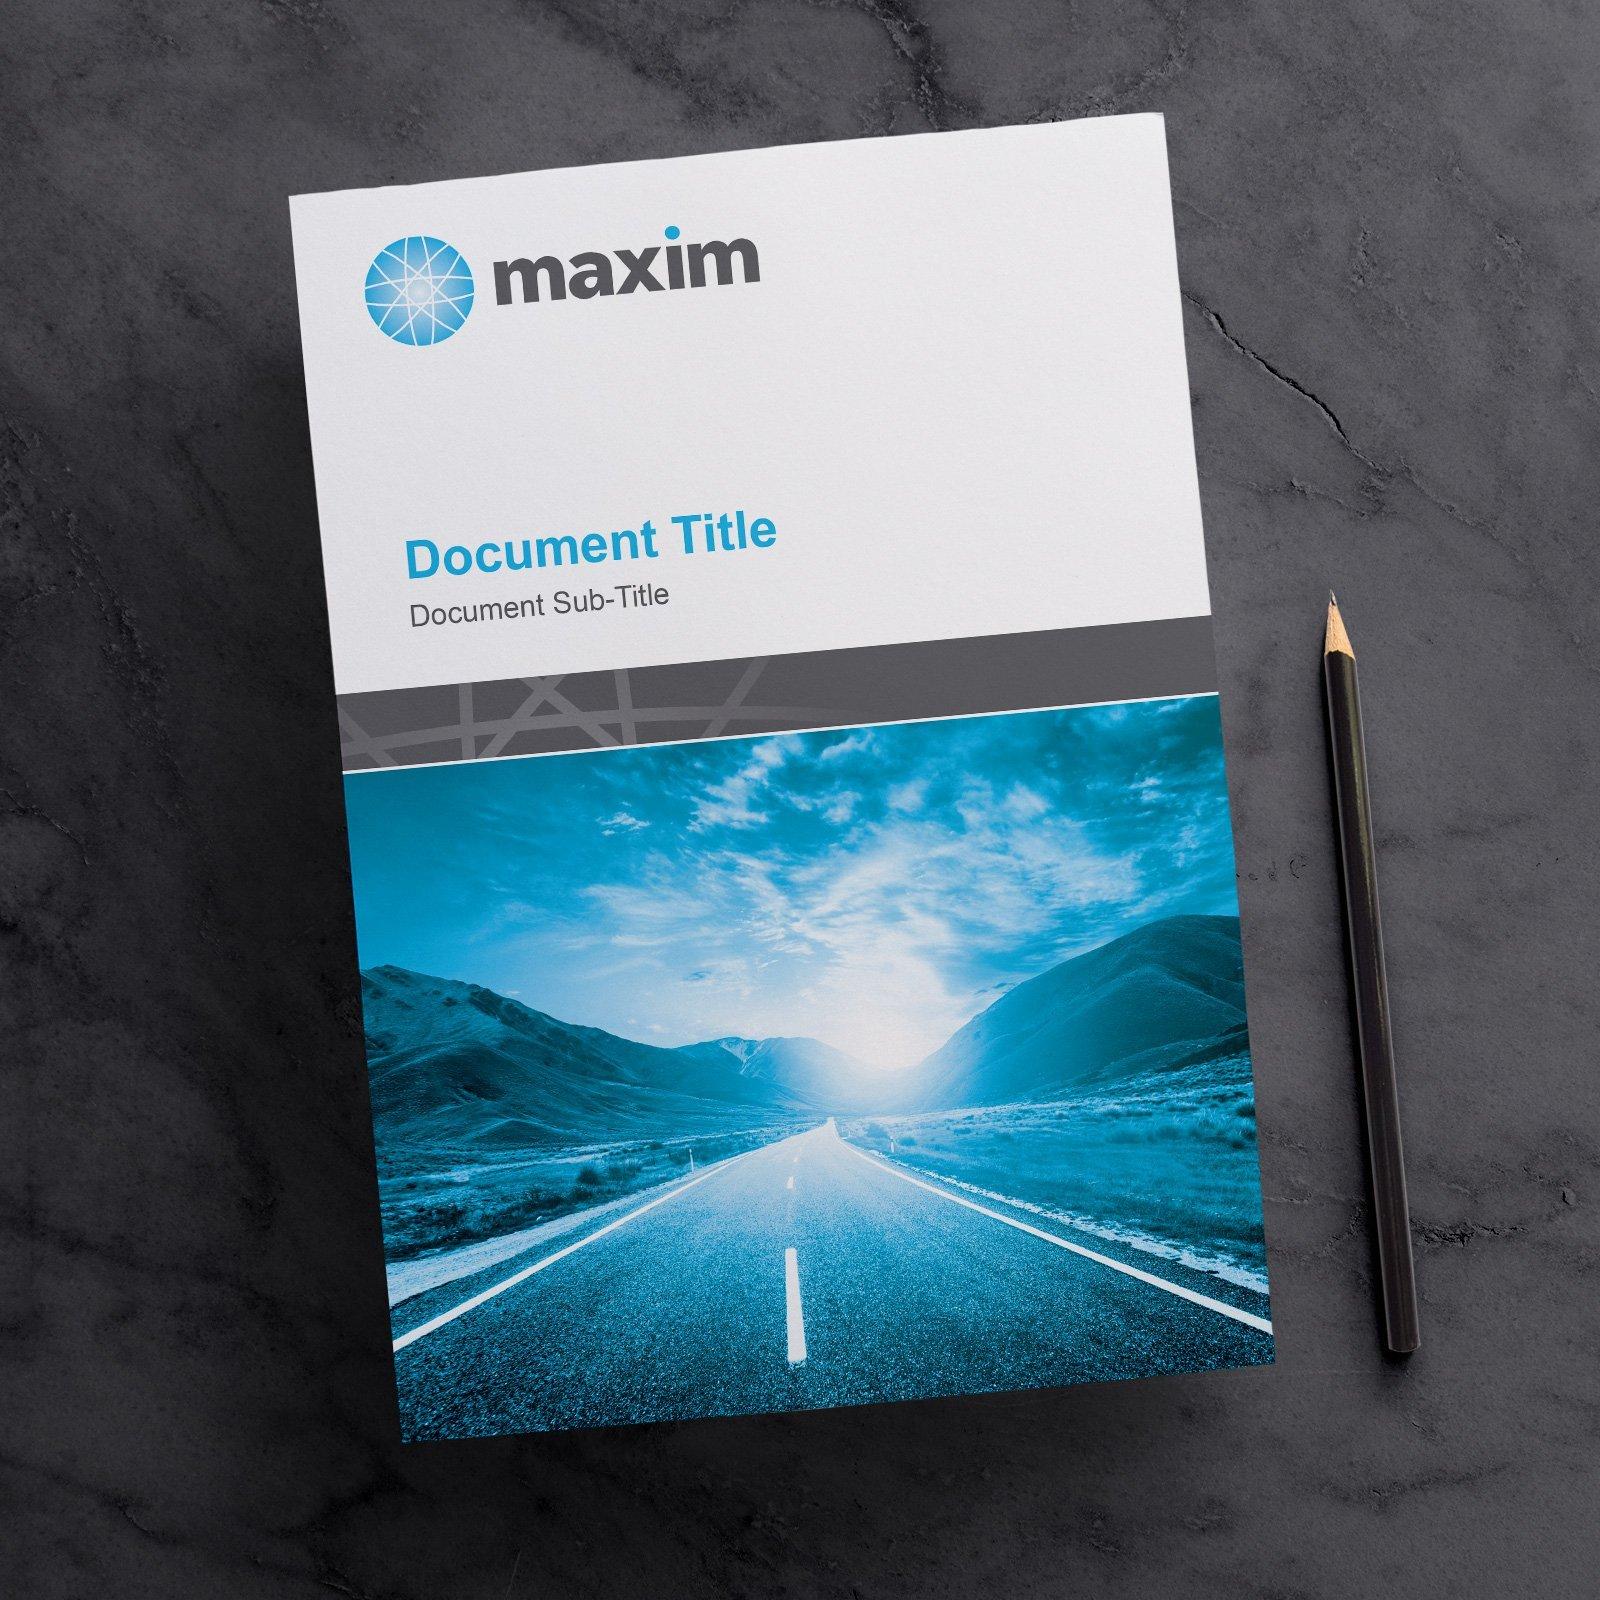 Maxim Word Document